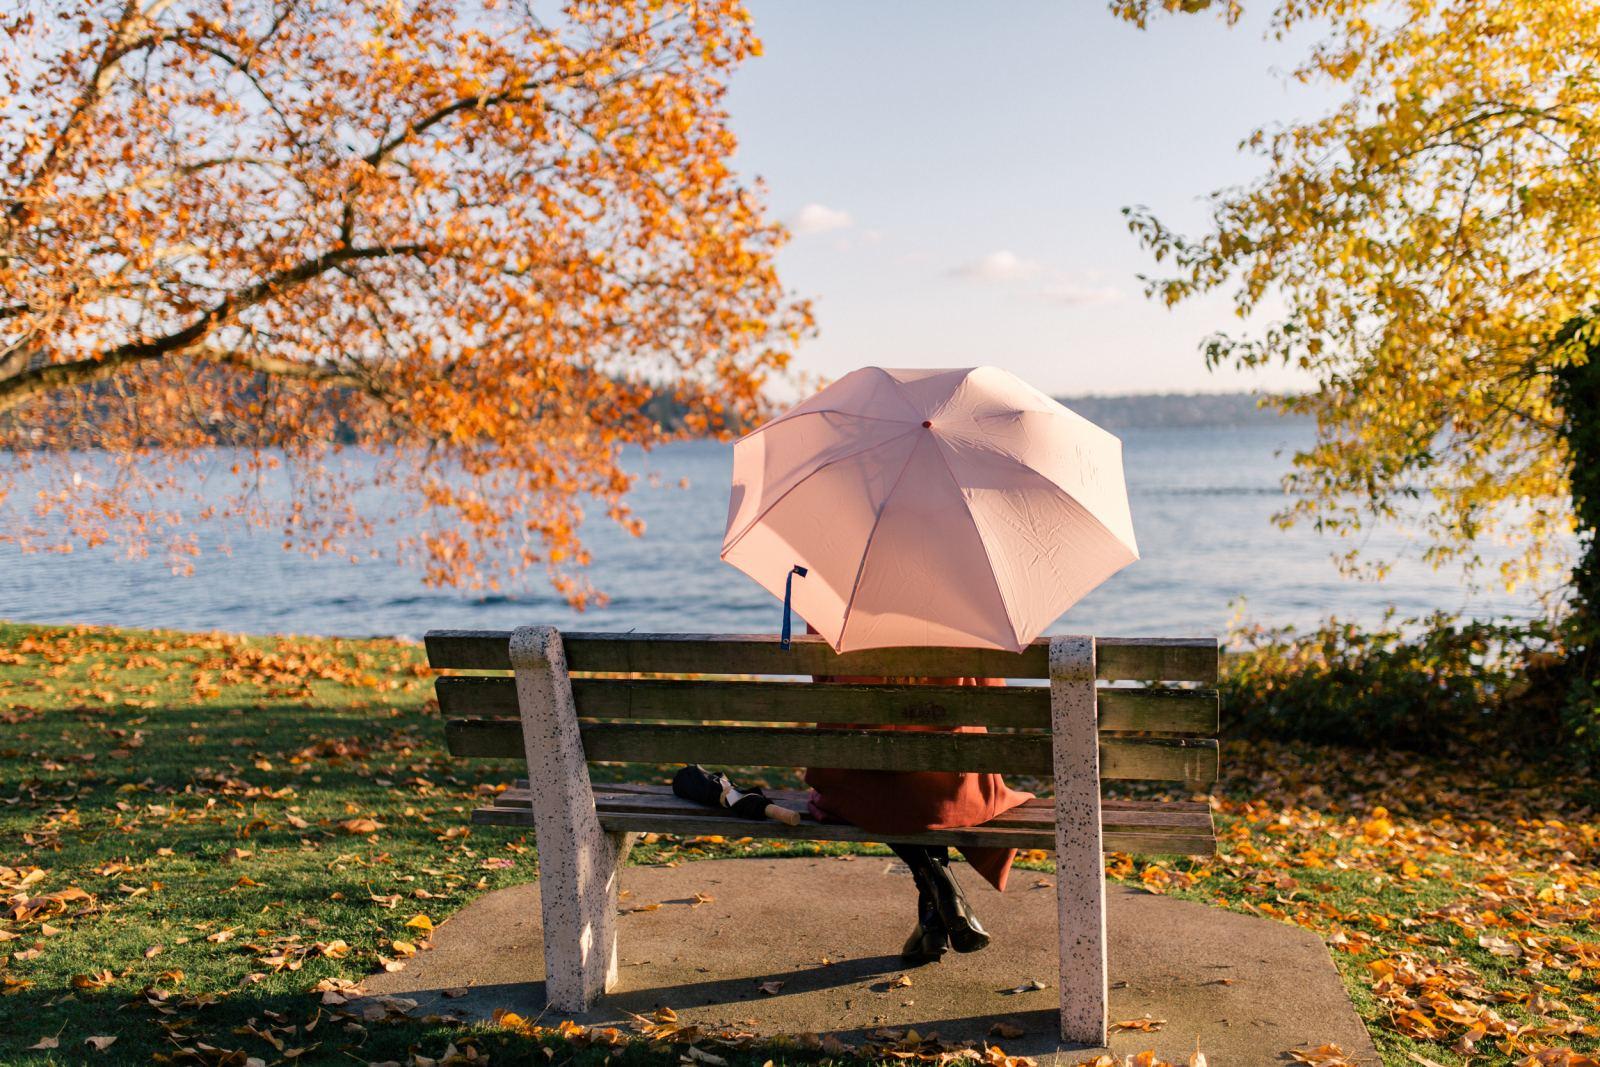 the perfect umbrella